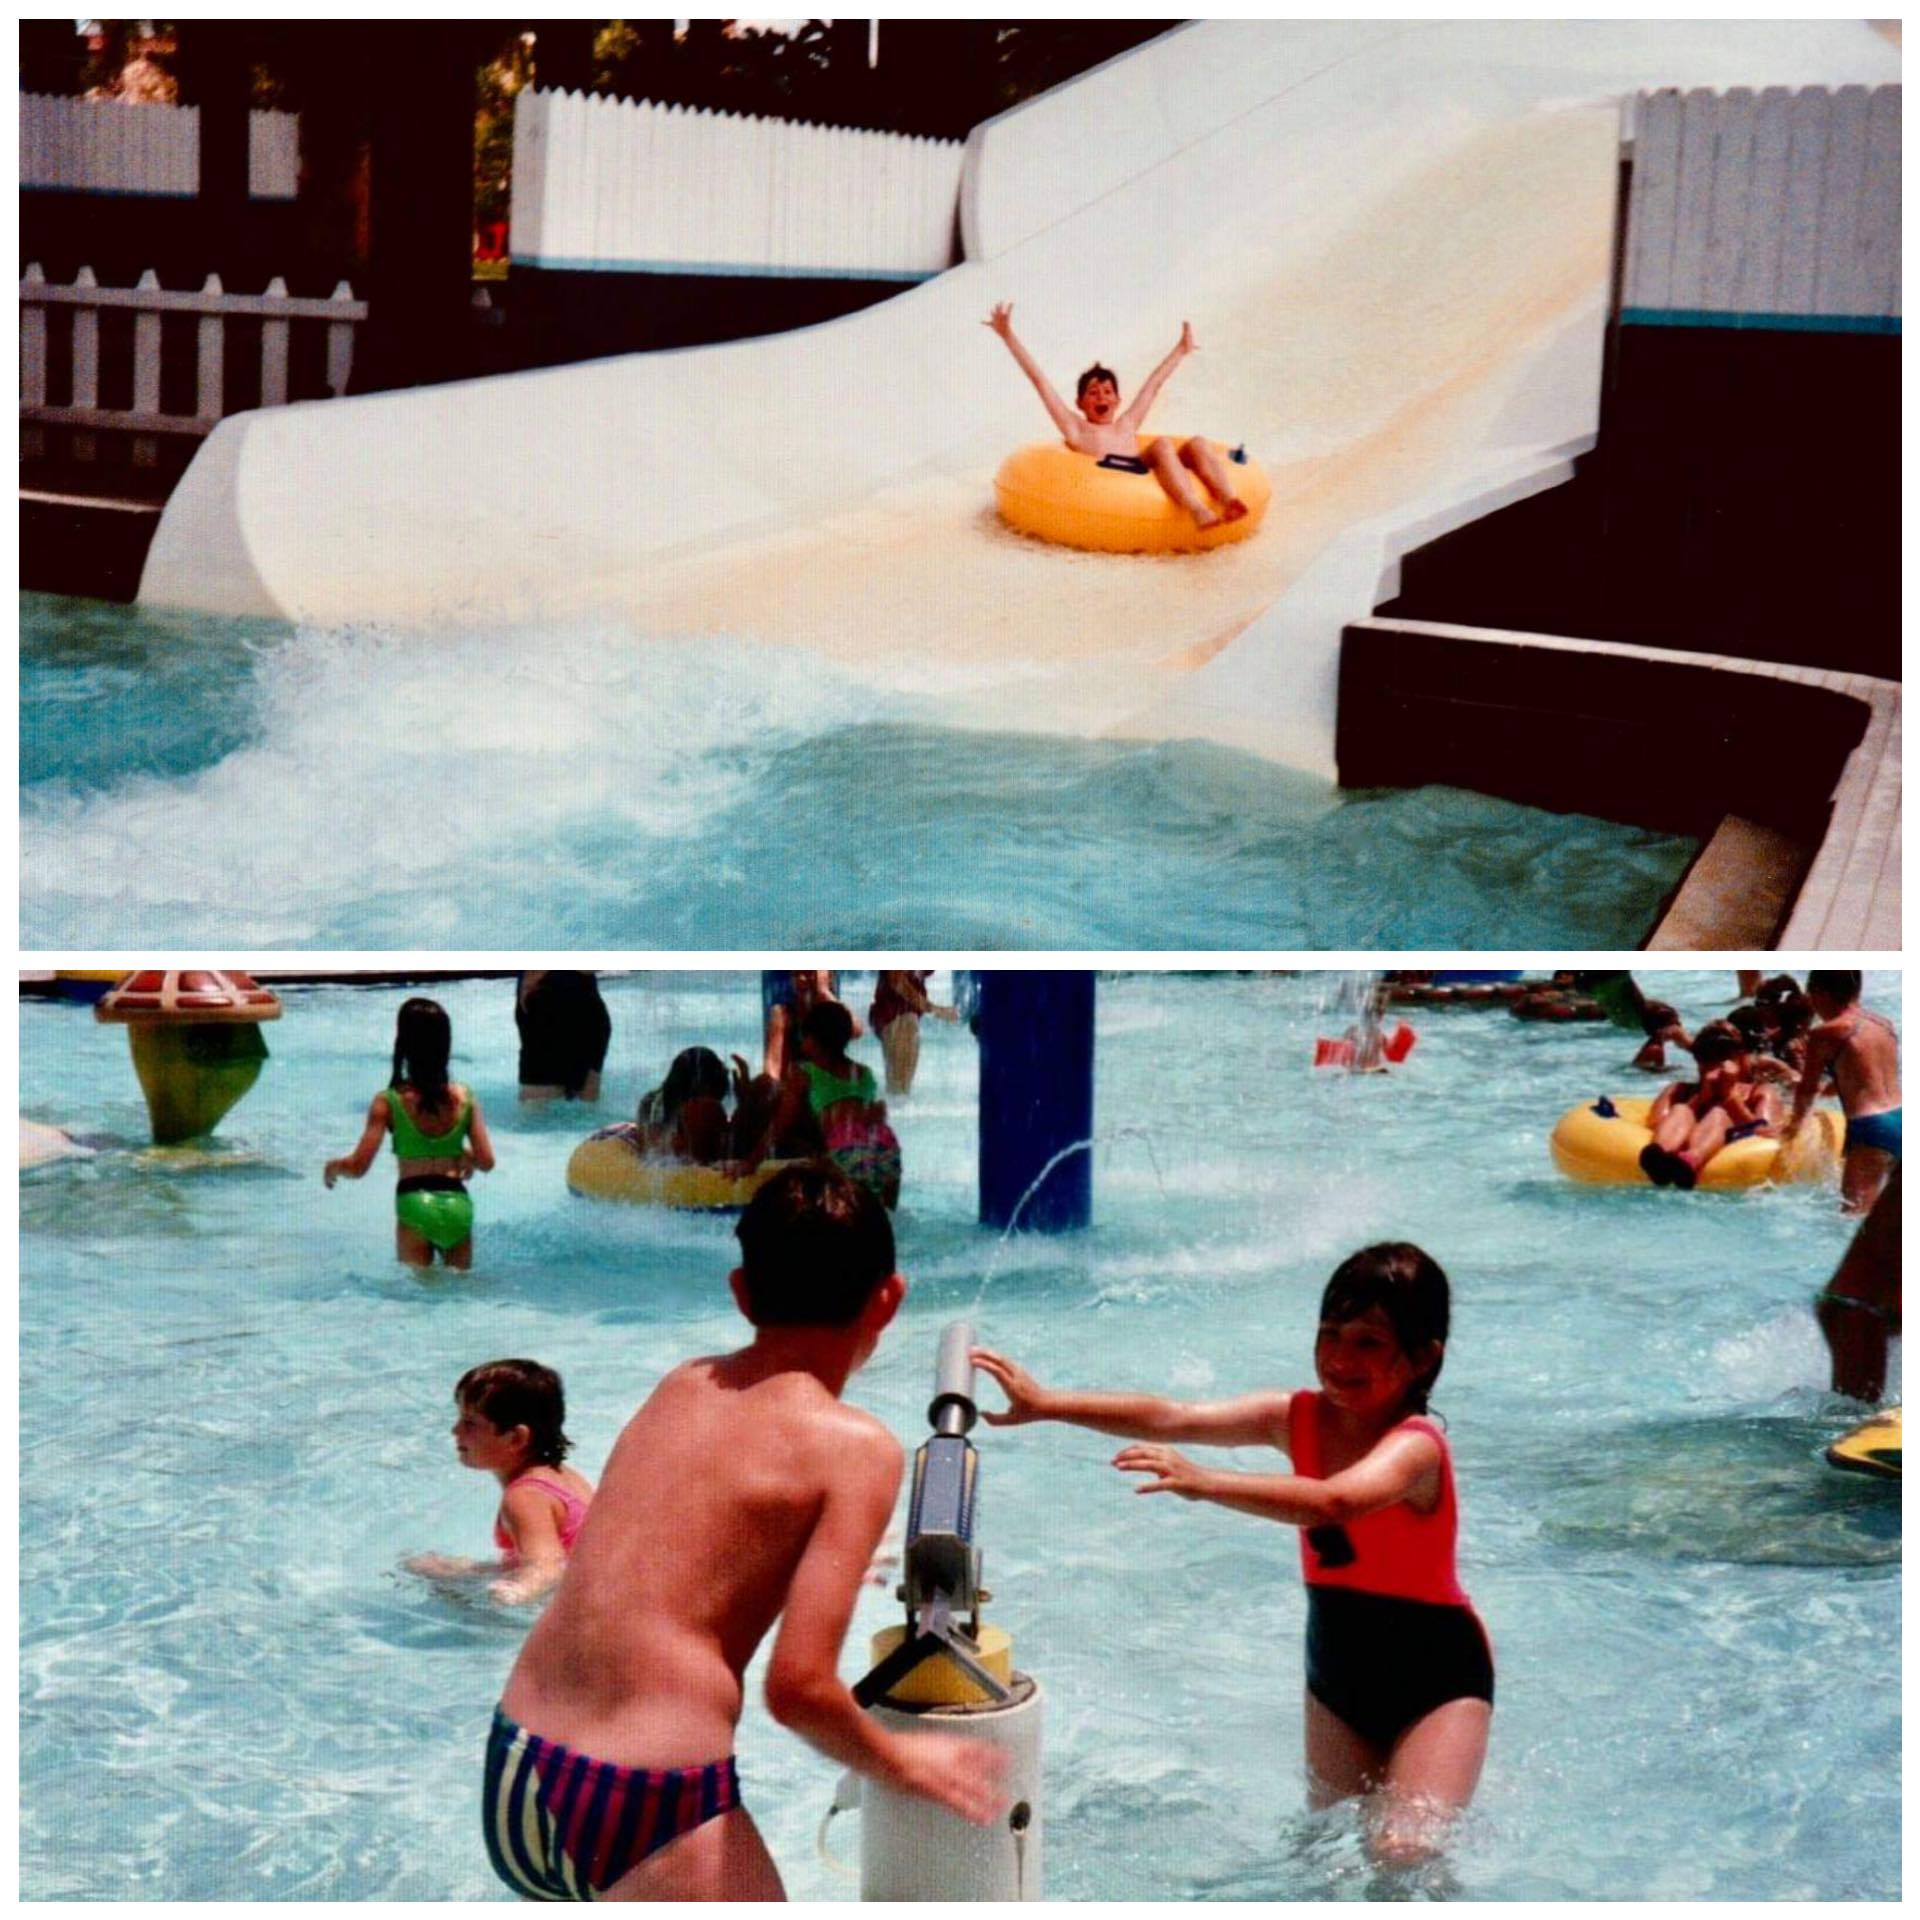 Retro Florida Water Mania in 1991.